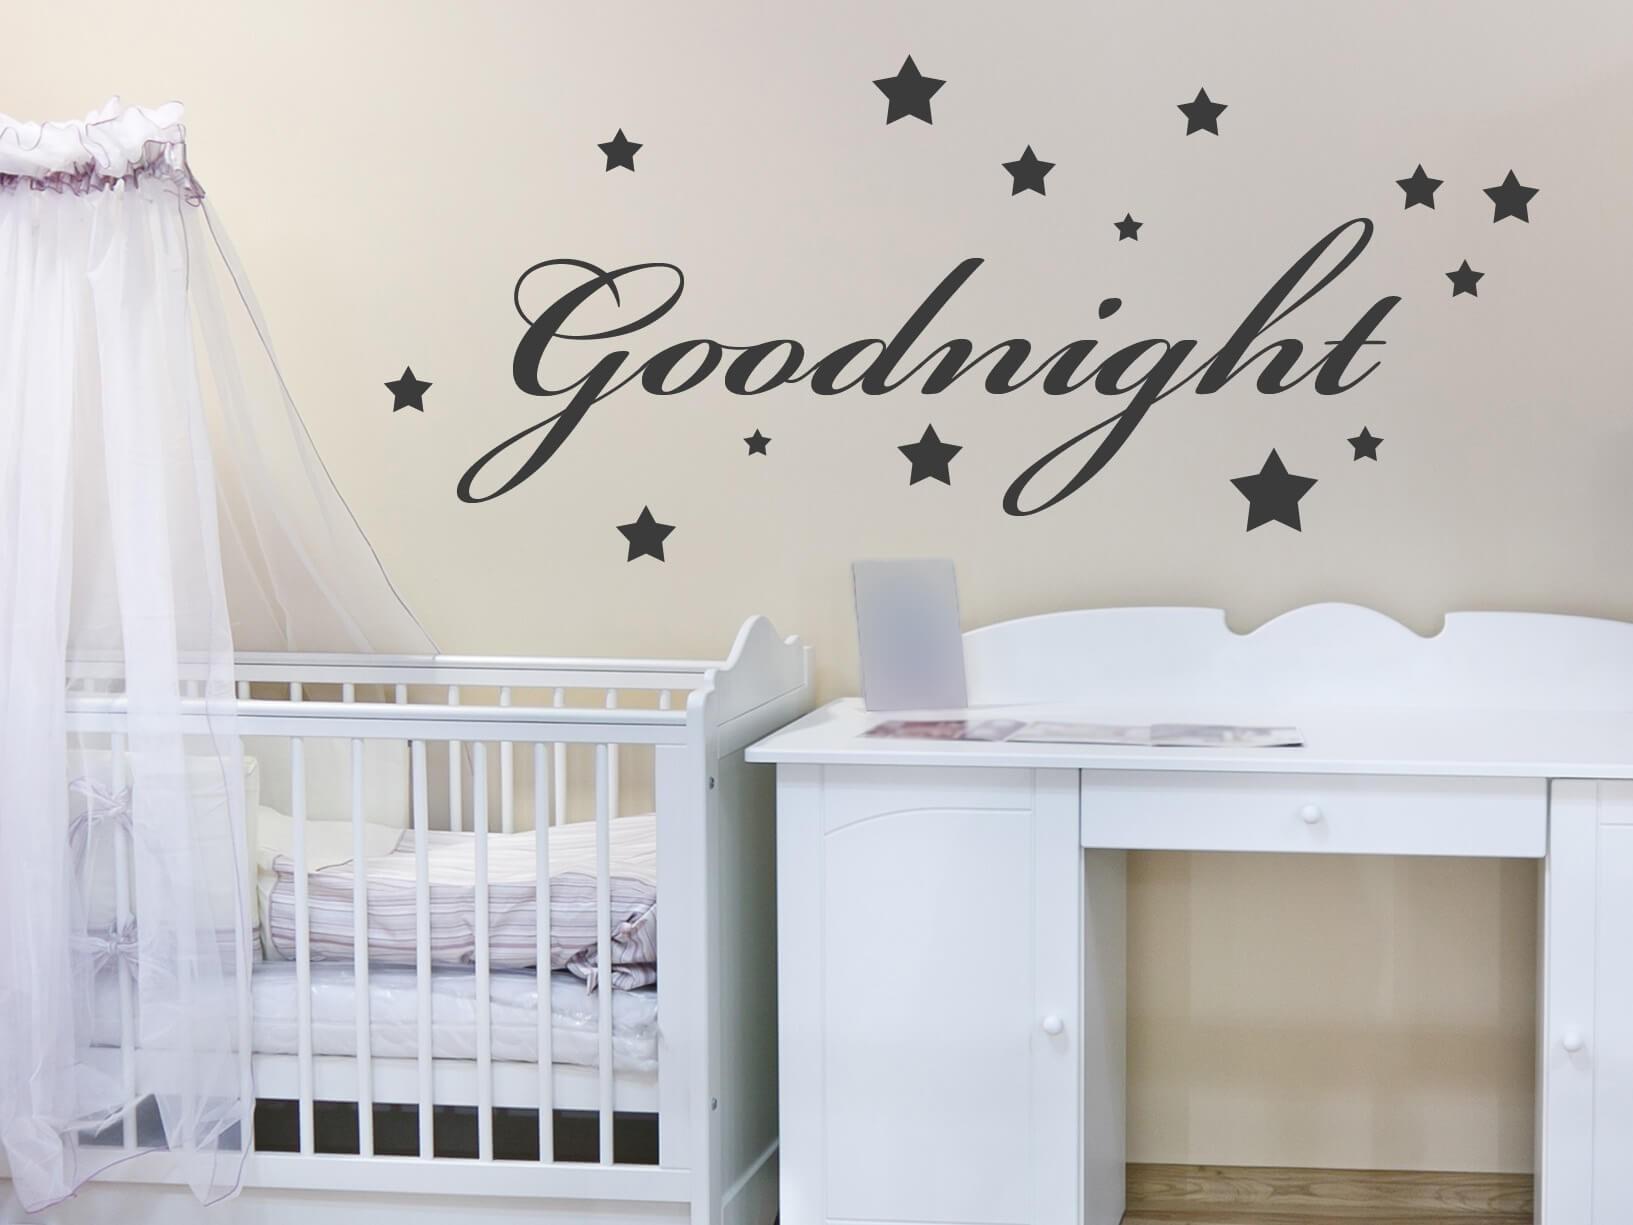 Muursticker Goodnight met sterren  Kinderkamer muurstickers